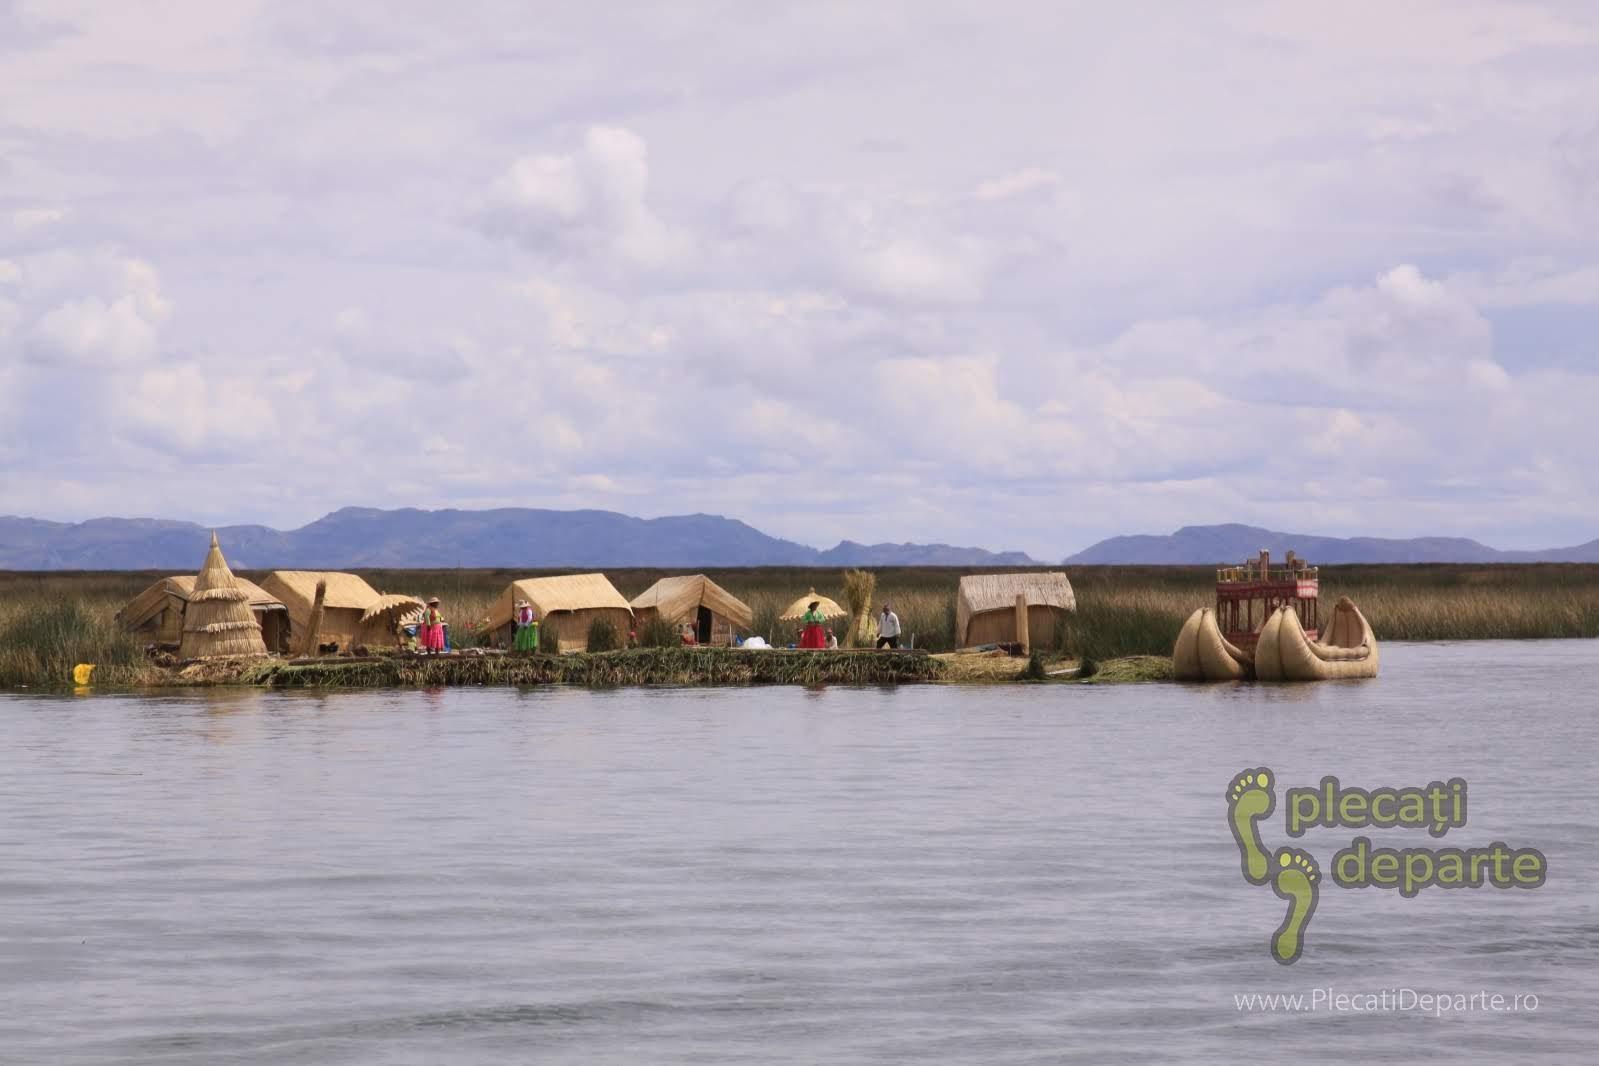 insulele plutitoare Los Uros, pe Lacul Titicaca, la 4000m in Peru